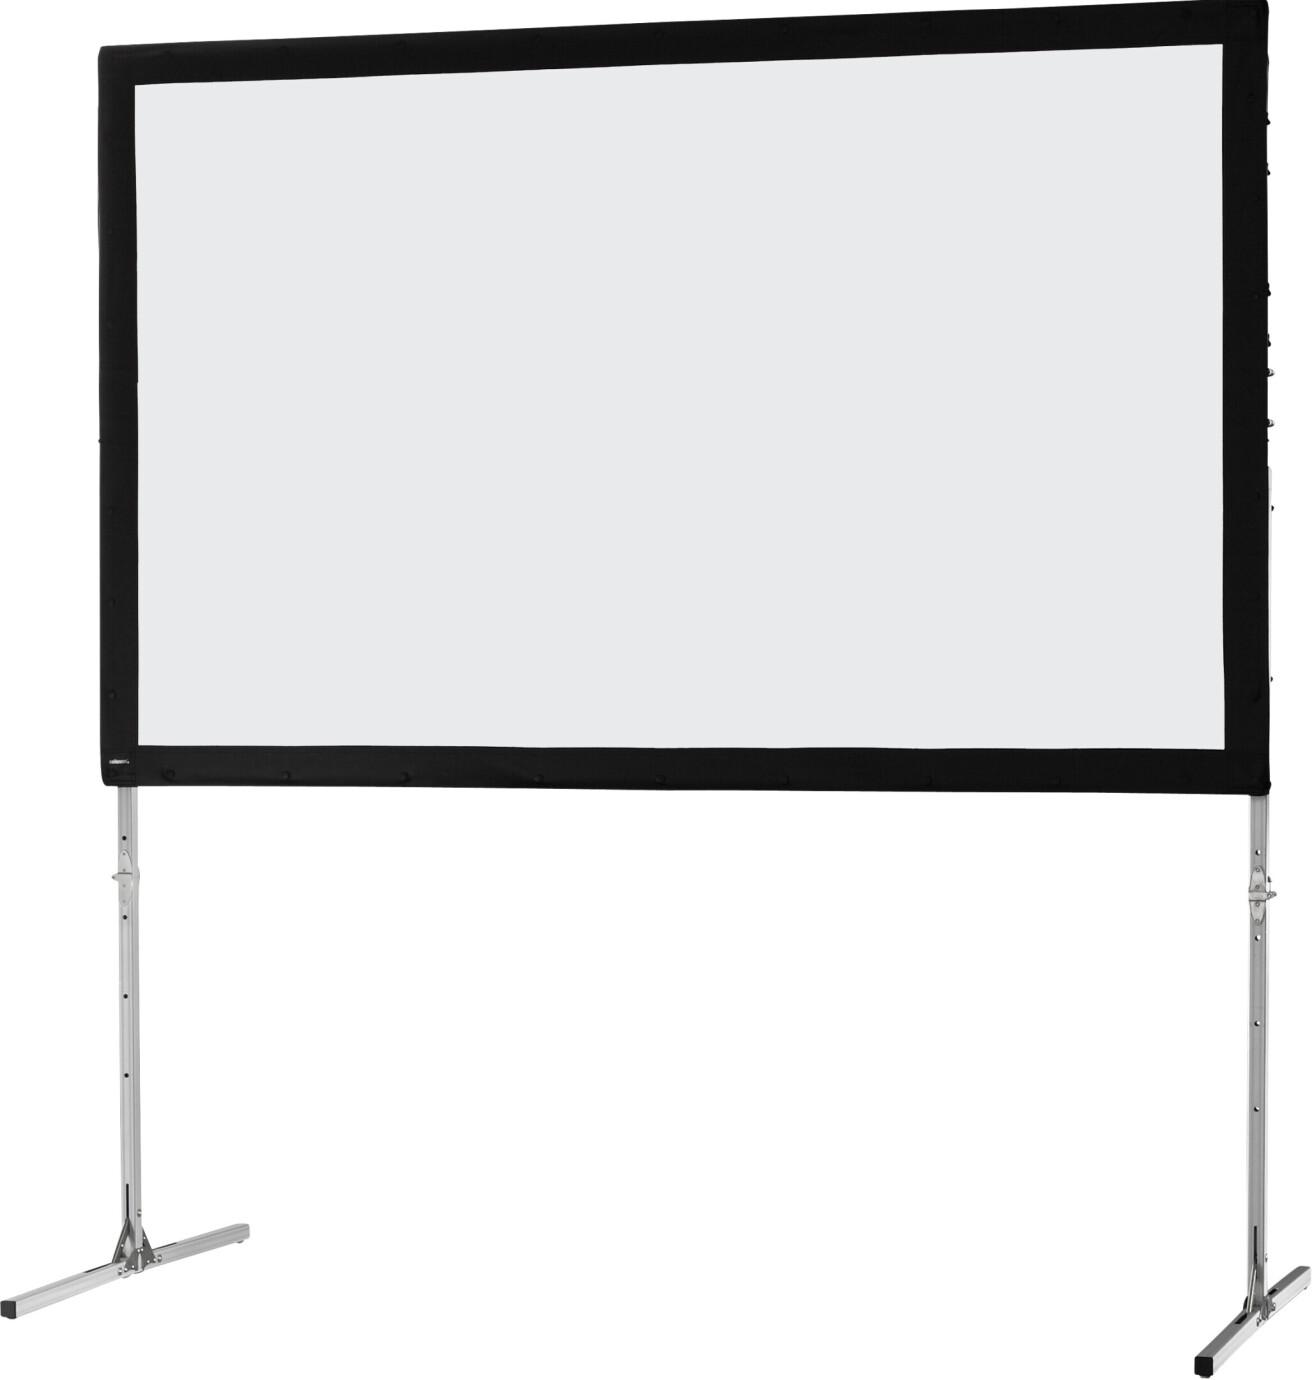 celexon Folding Frame screen 305 x 190cm Mobile Expert, front projection